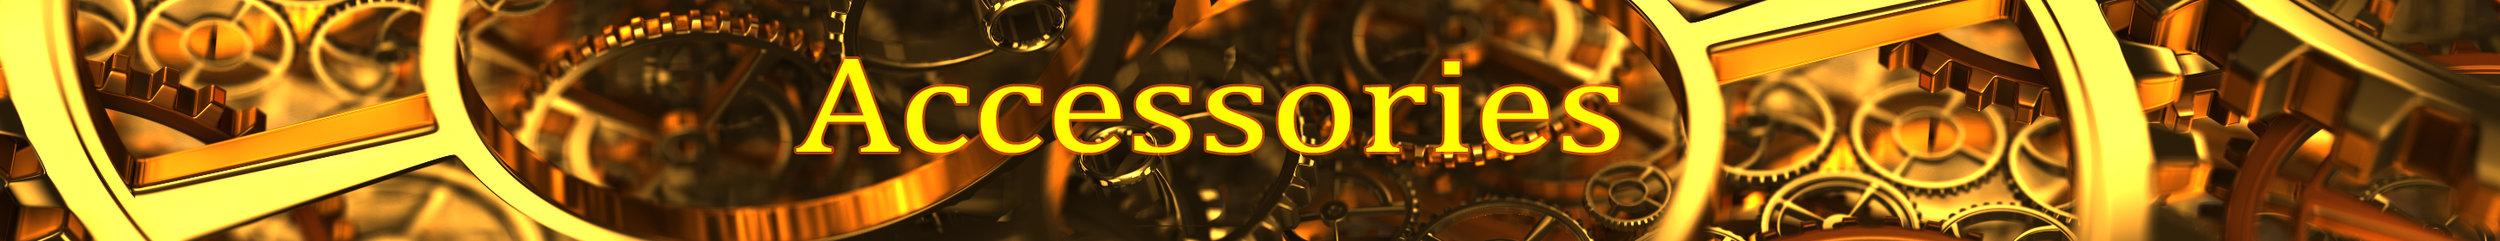 gearaccessories.jpg